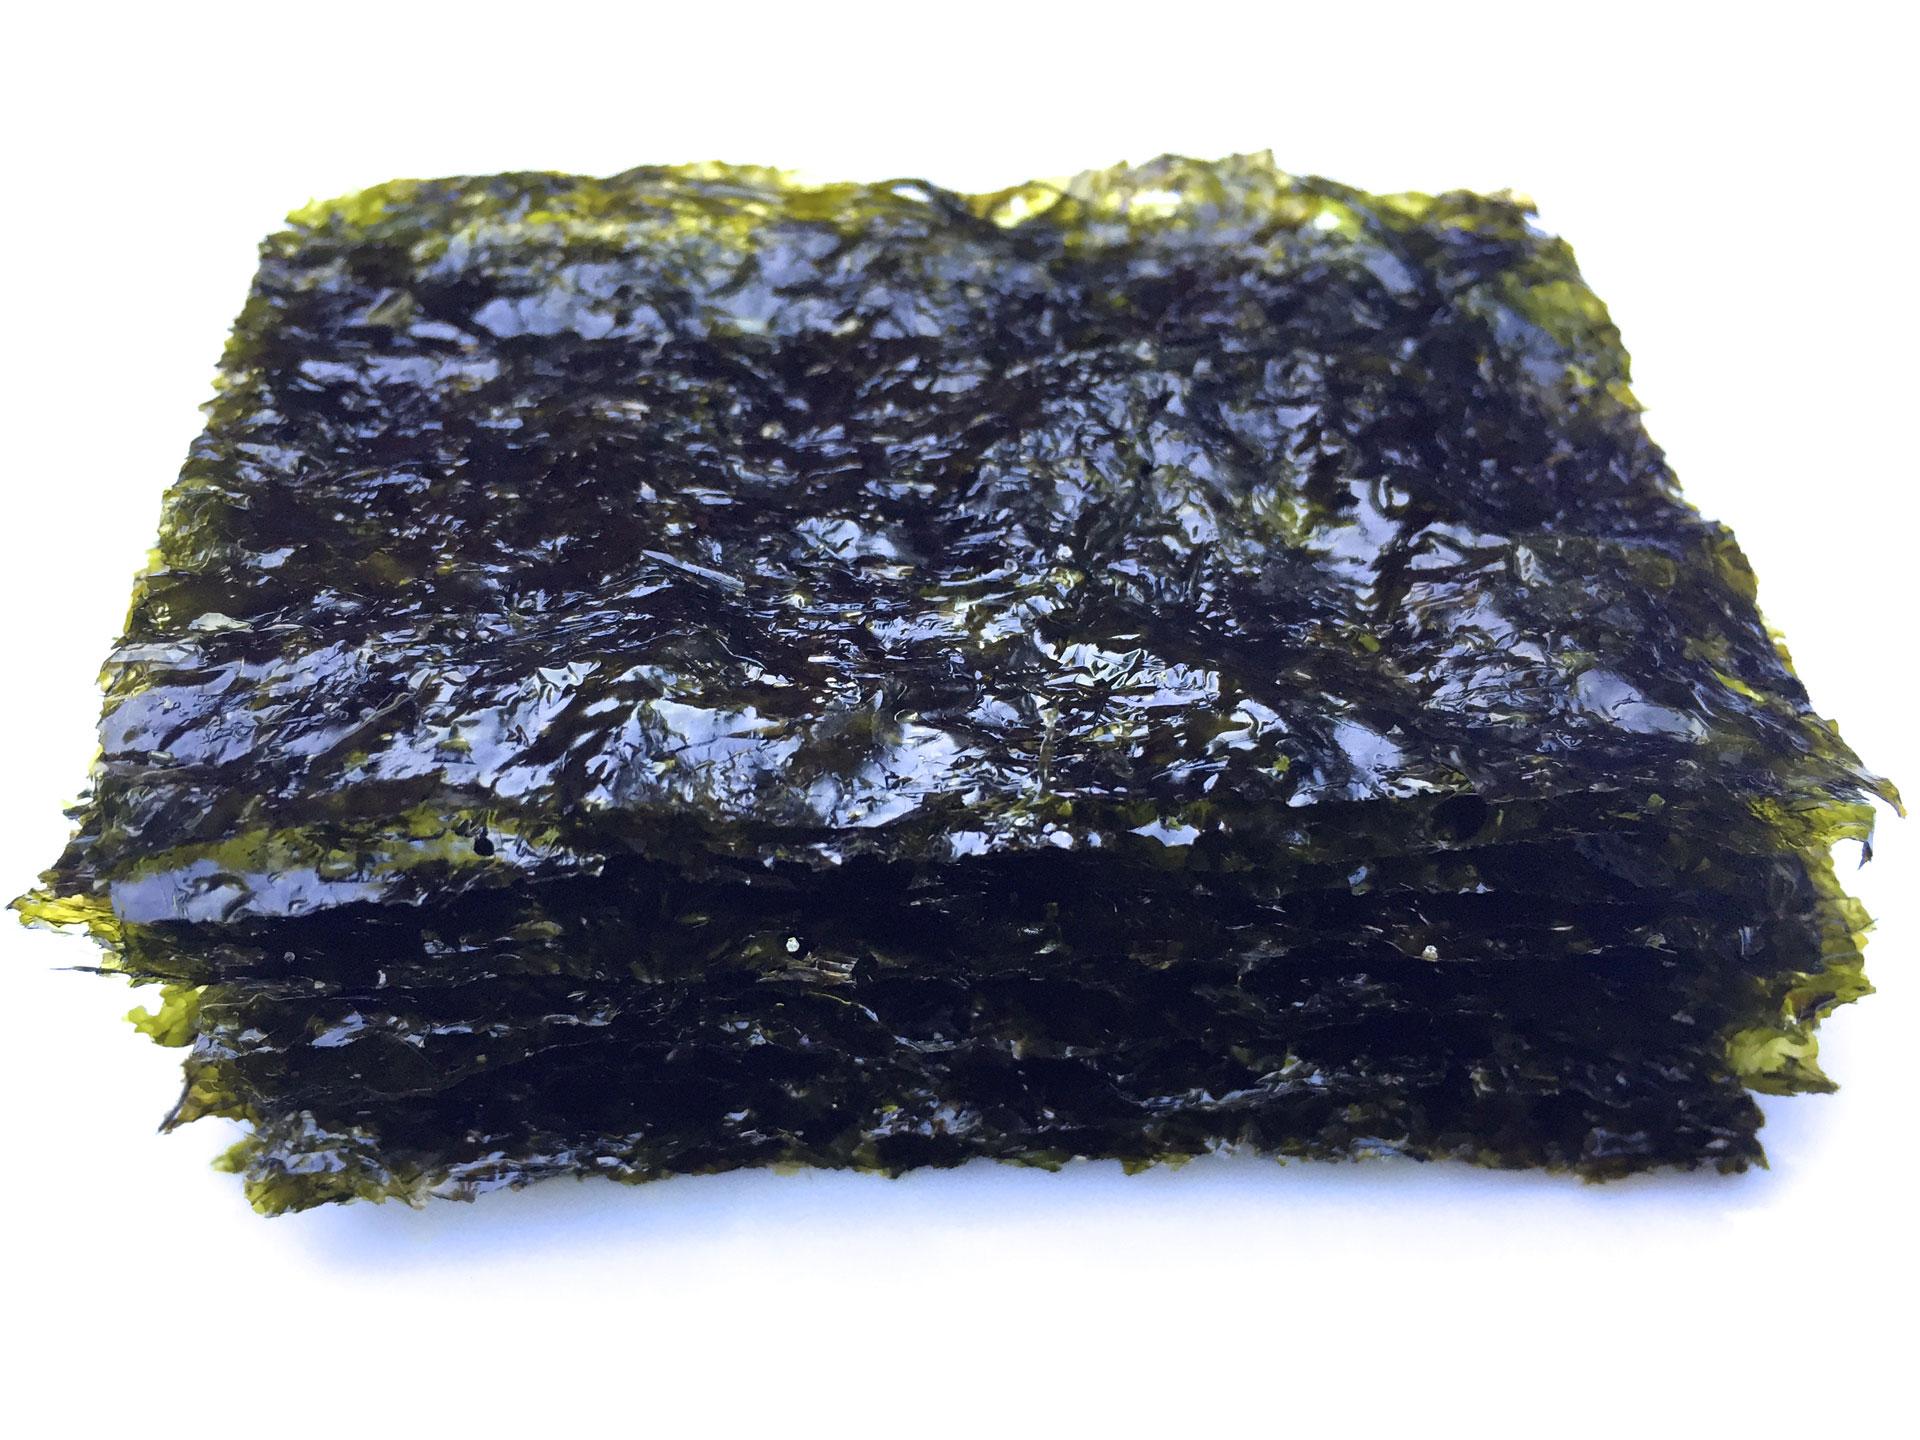 Japan Ships First Seaweed, Farmed 6 Miles from Fukushima Meltdowns, for Human Consumption